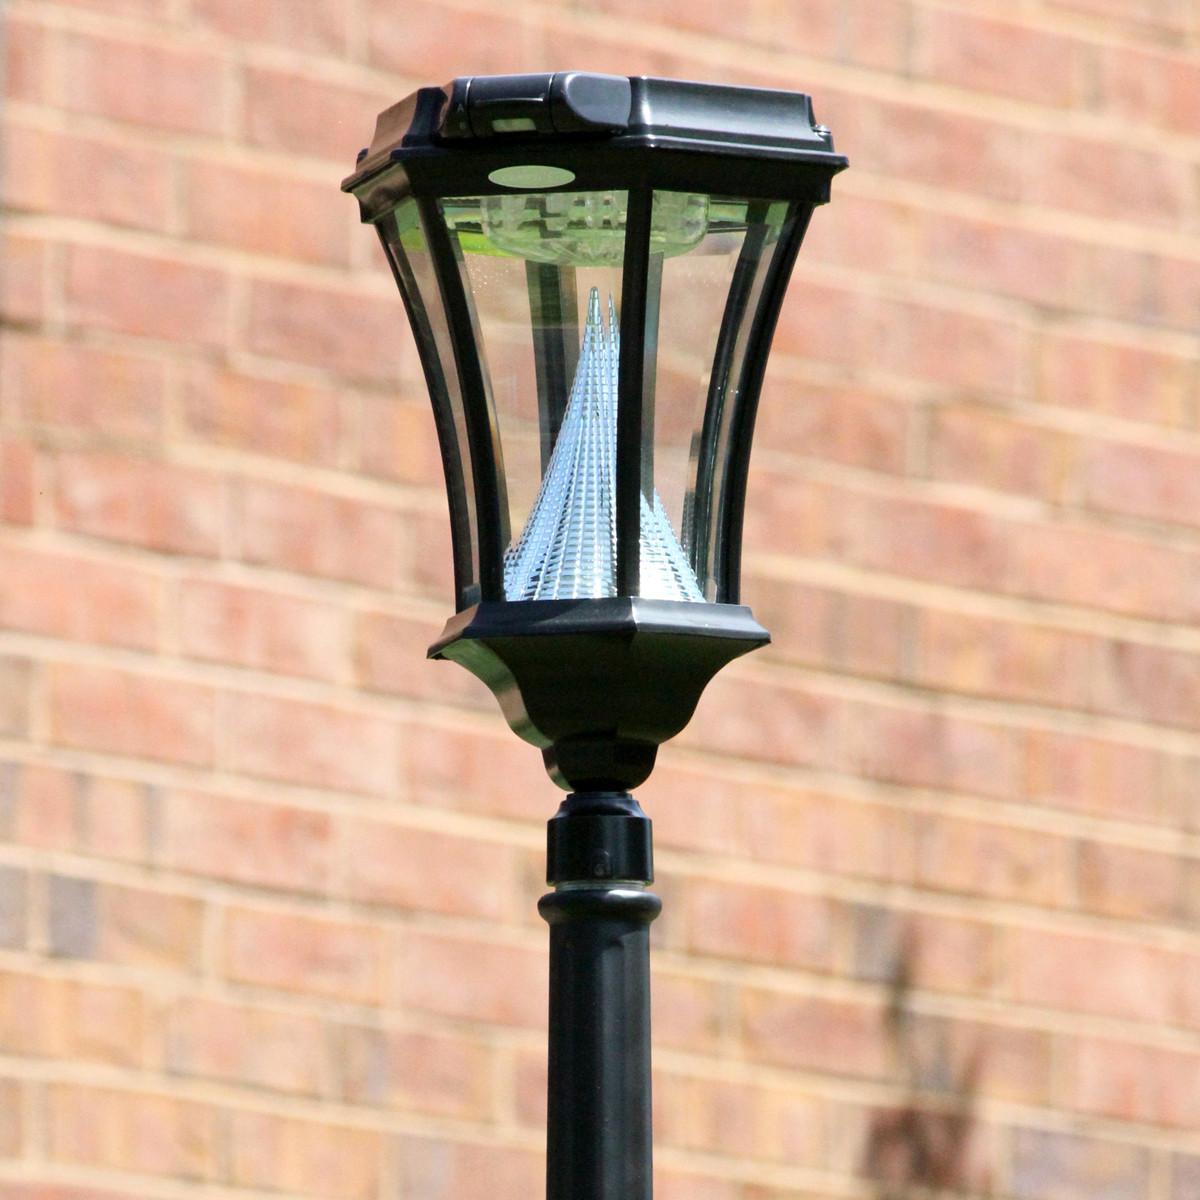 Best ideas about Motion Sensor Porch Light . Save or Pin Wiring Motion Sensor Porch Light Fixture — Karenefoley Now.